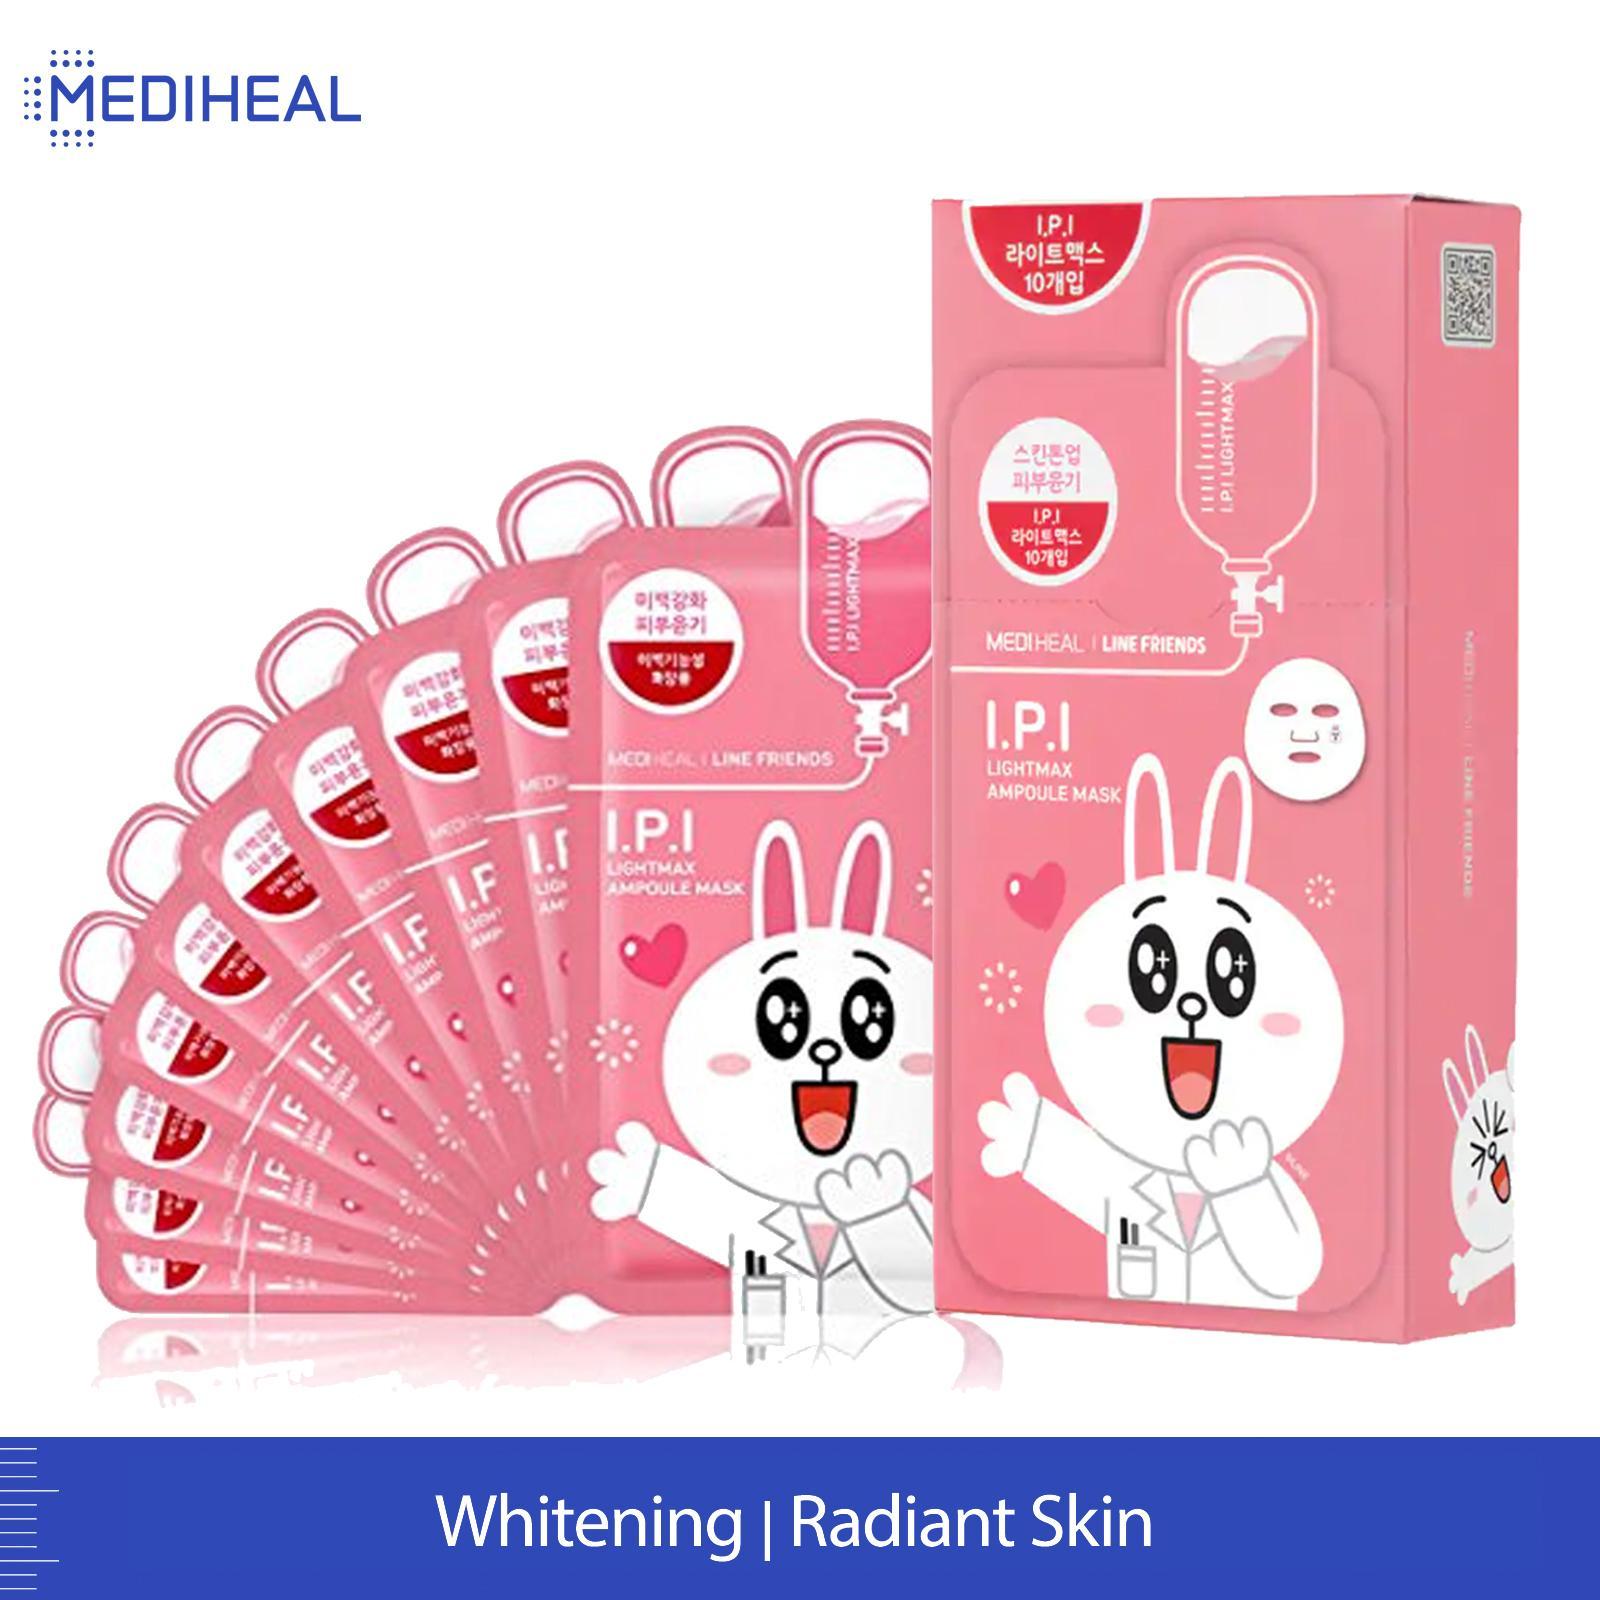 MEDIHEAL LINE I.P.I Lightmax Ampoule Mask Box (27ml x 10pc)